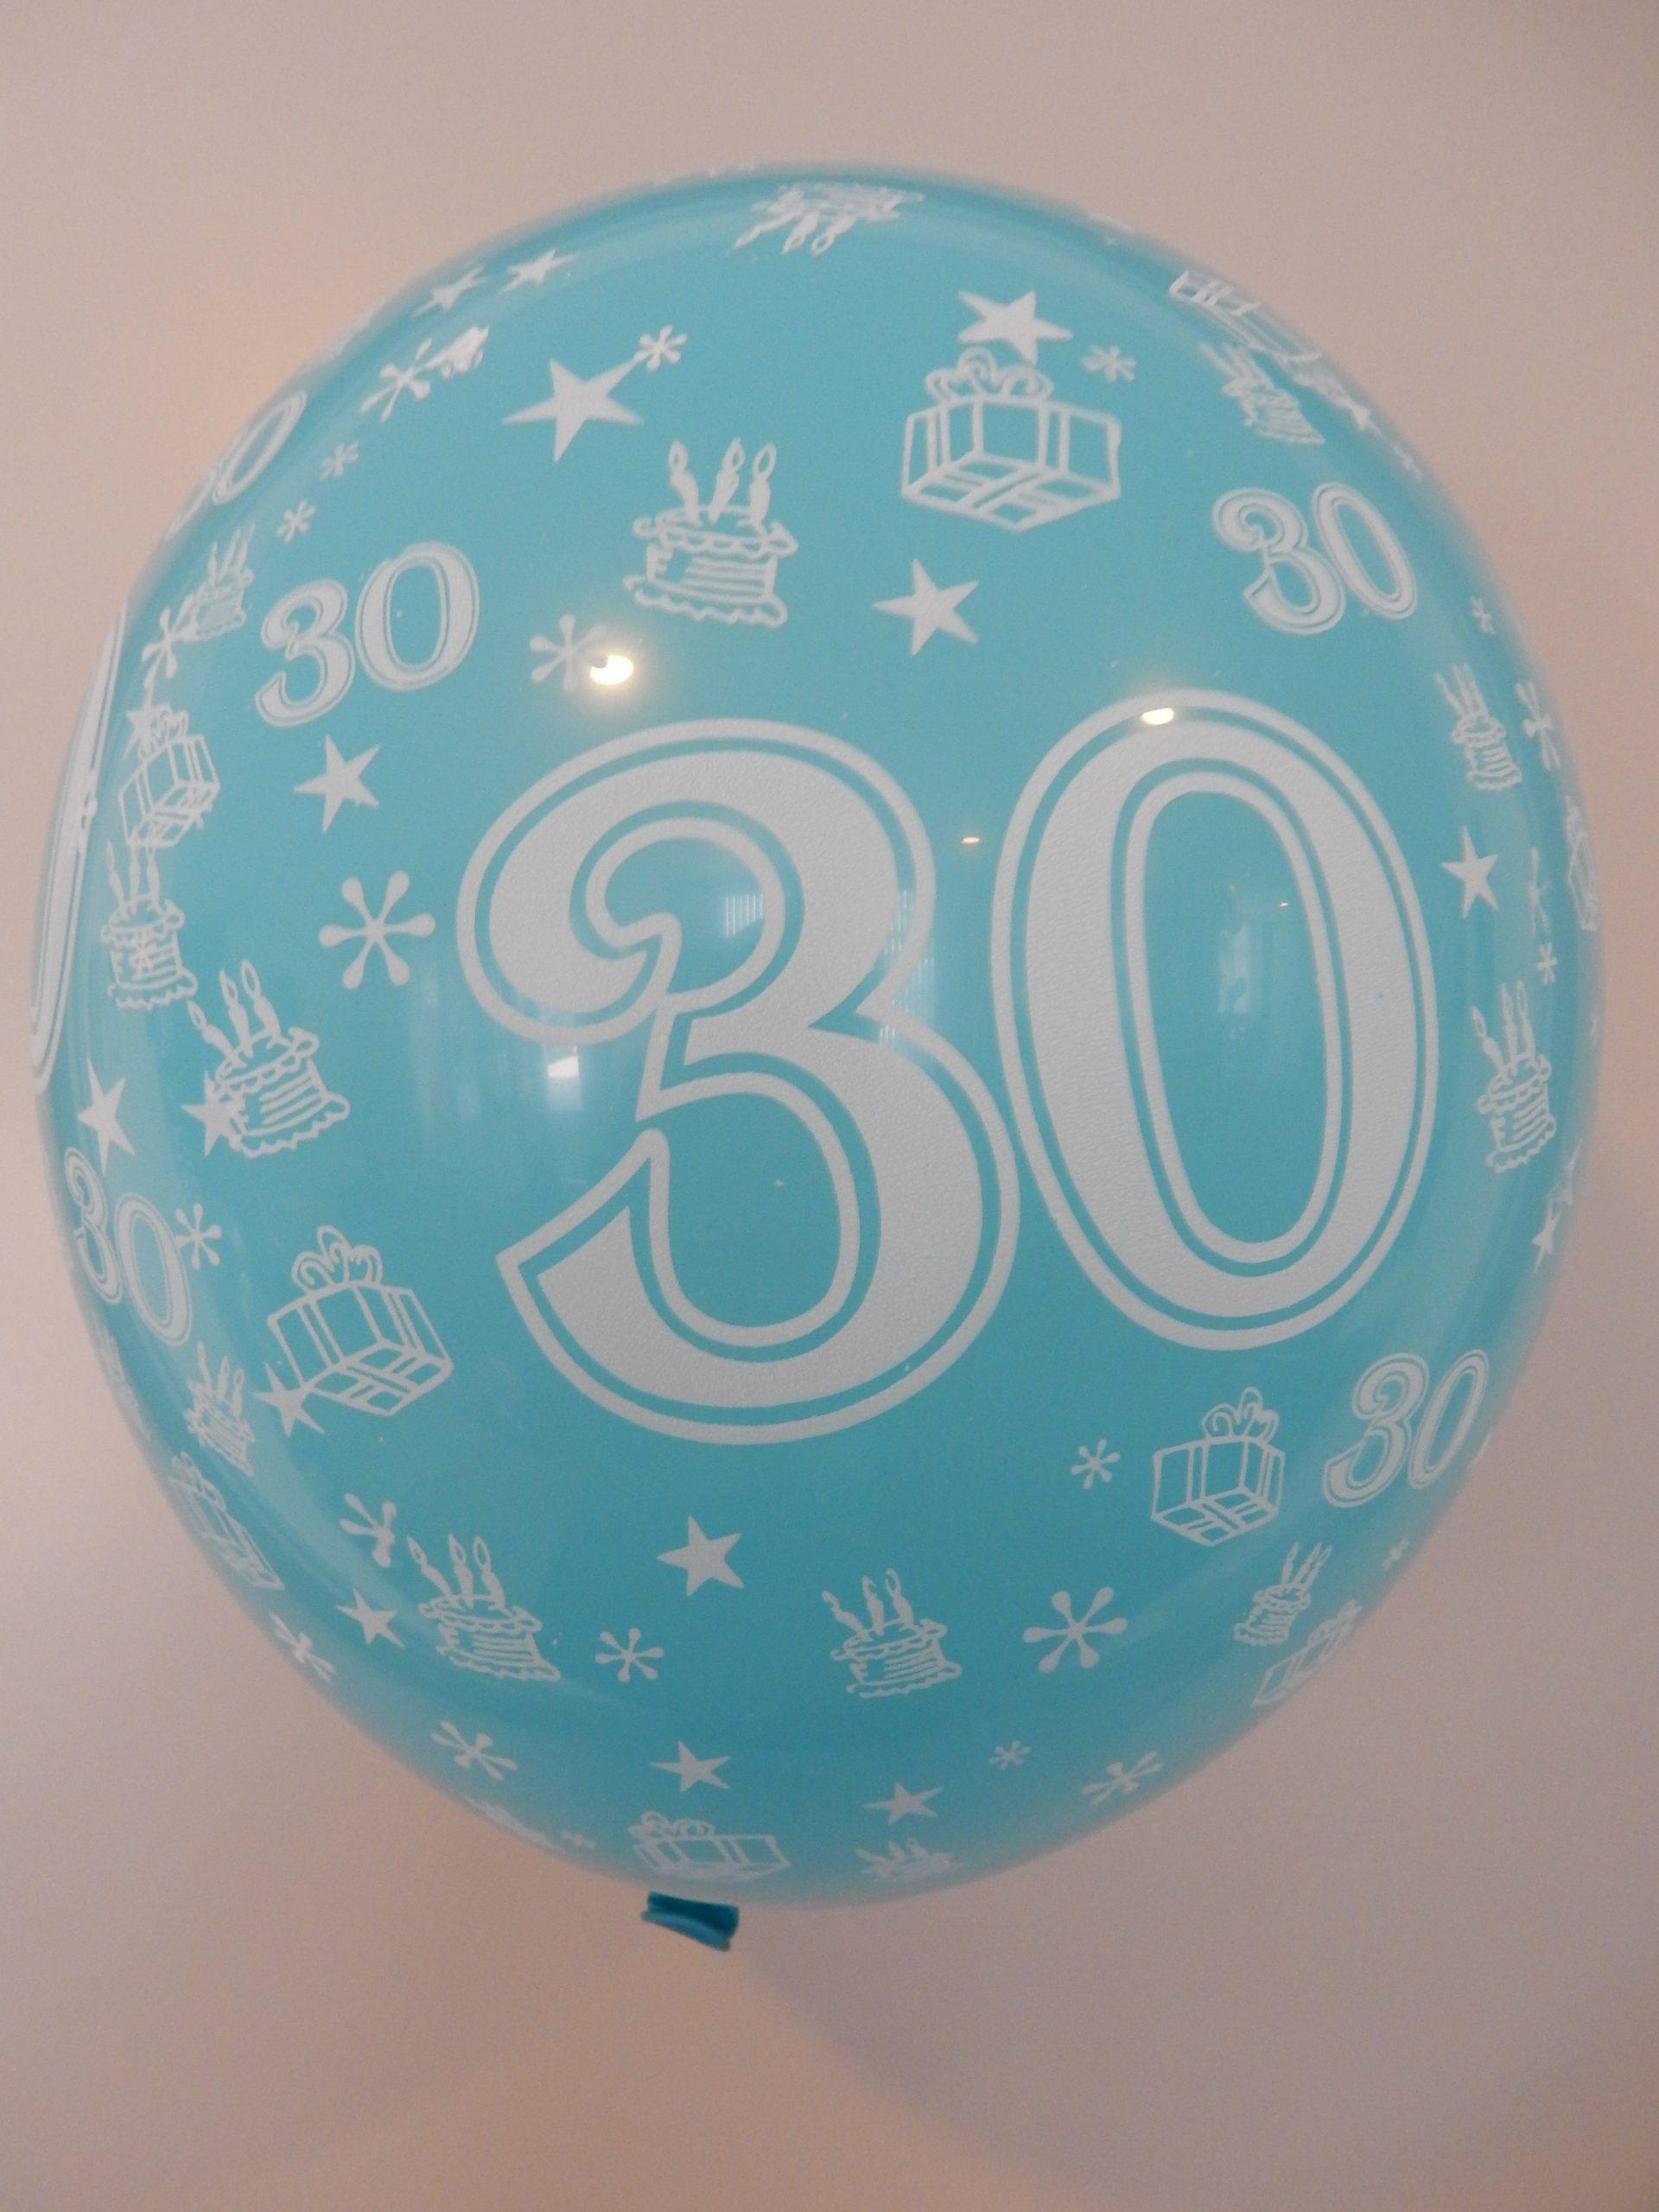 "5st Helium Ballonnen Assorti 30 Jaar 12"""